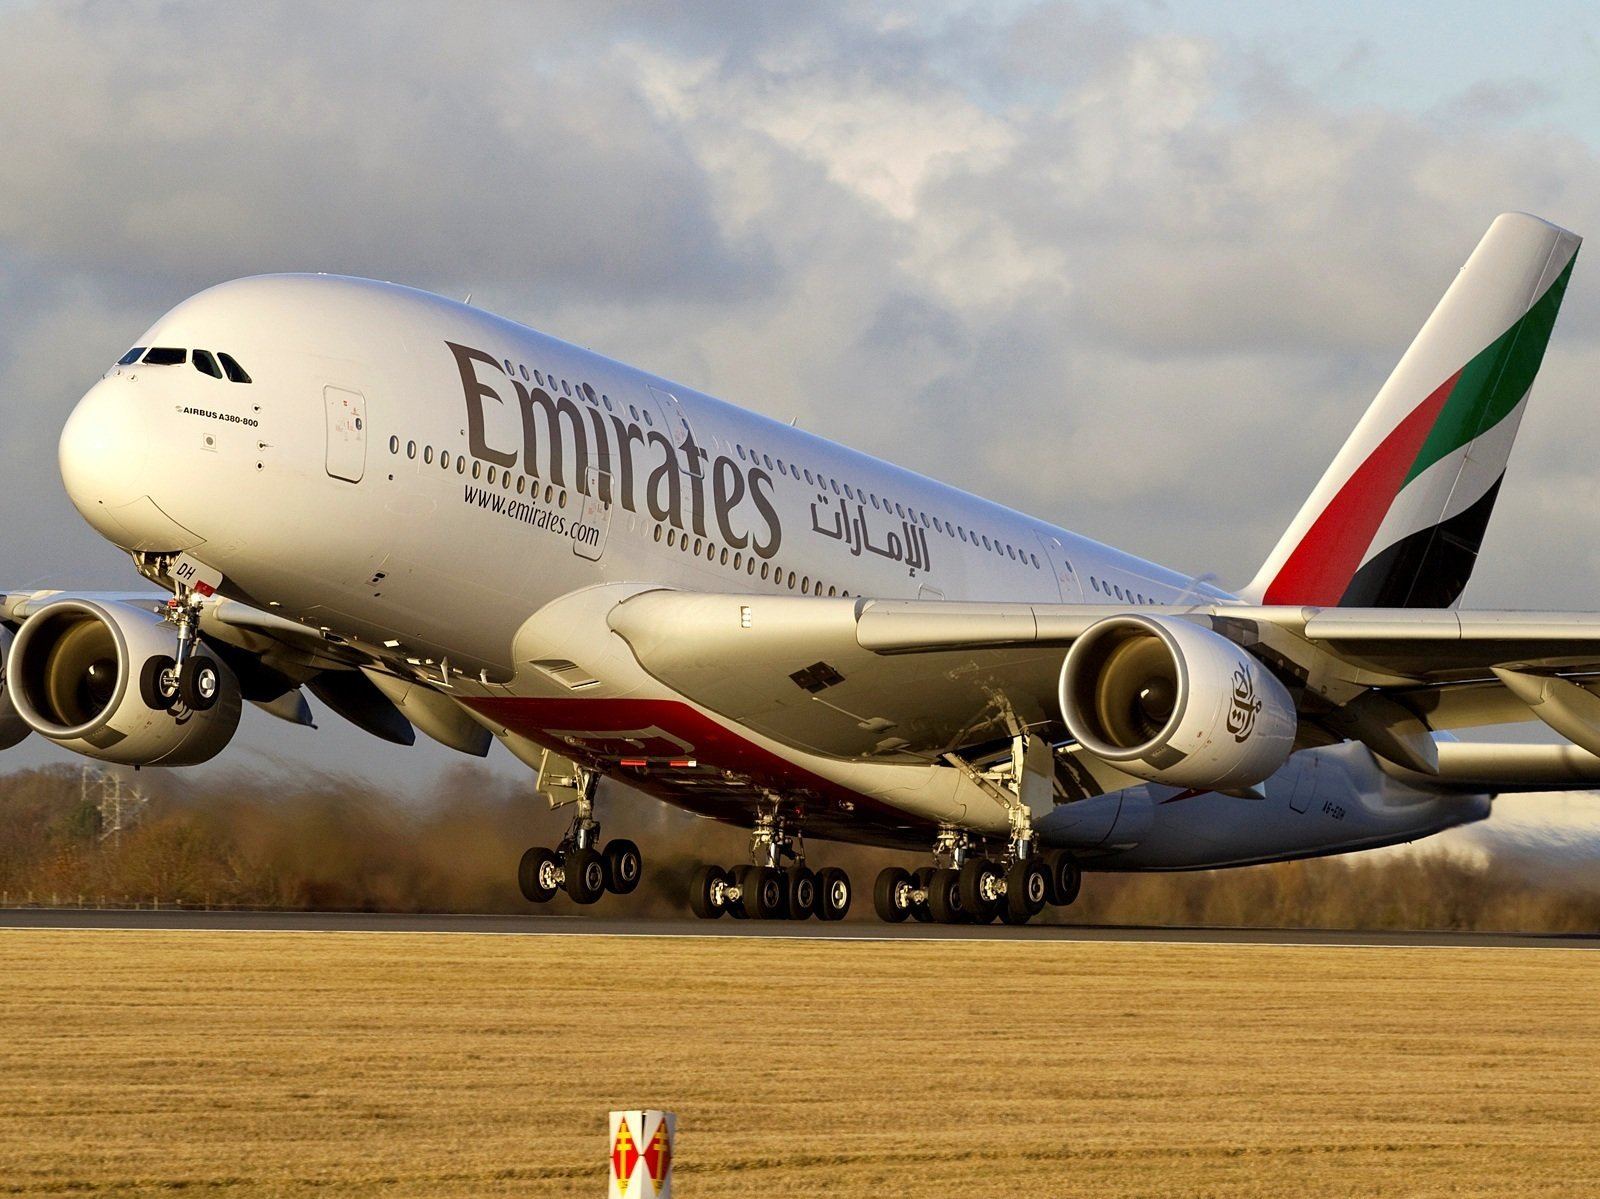 Daily Flight From Budapest To Dubai